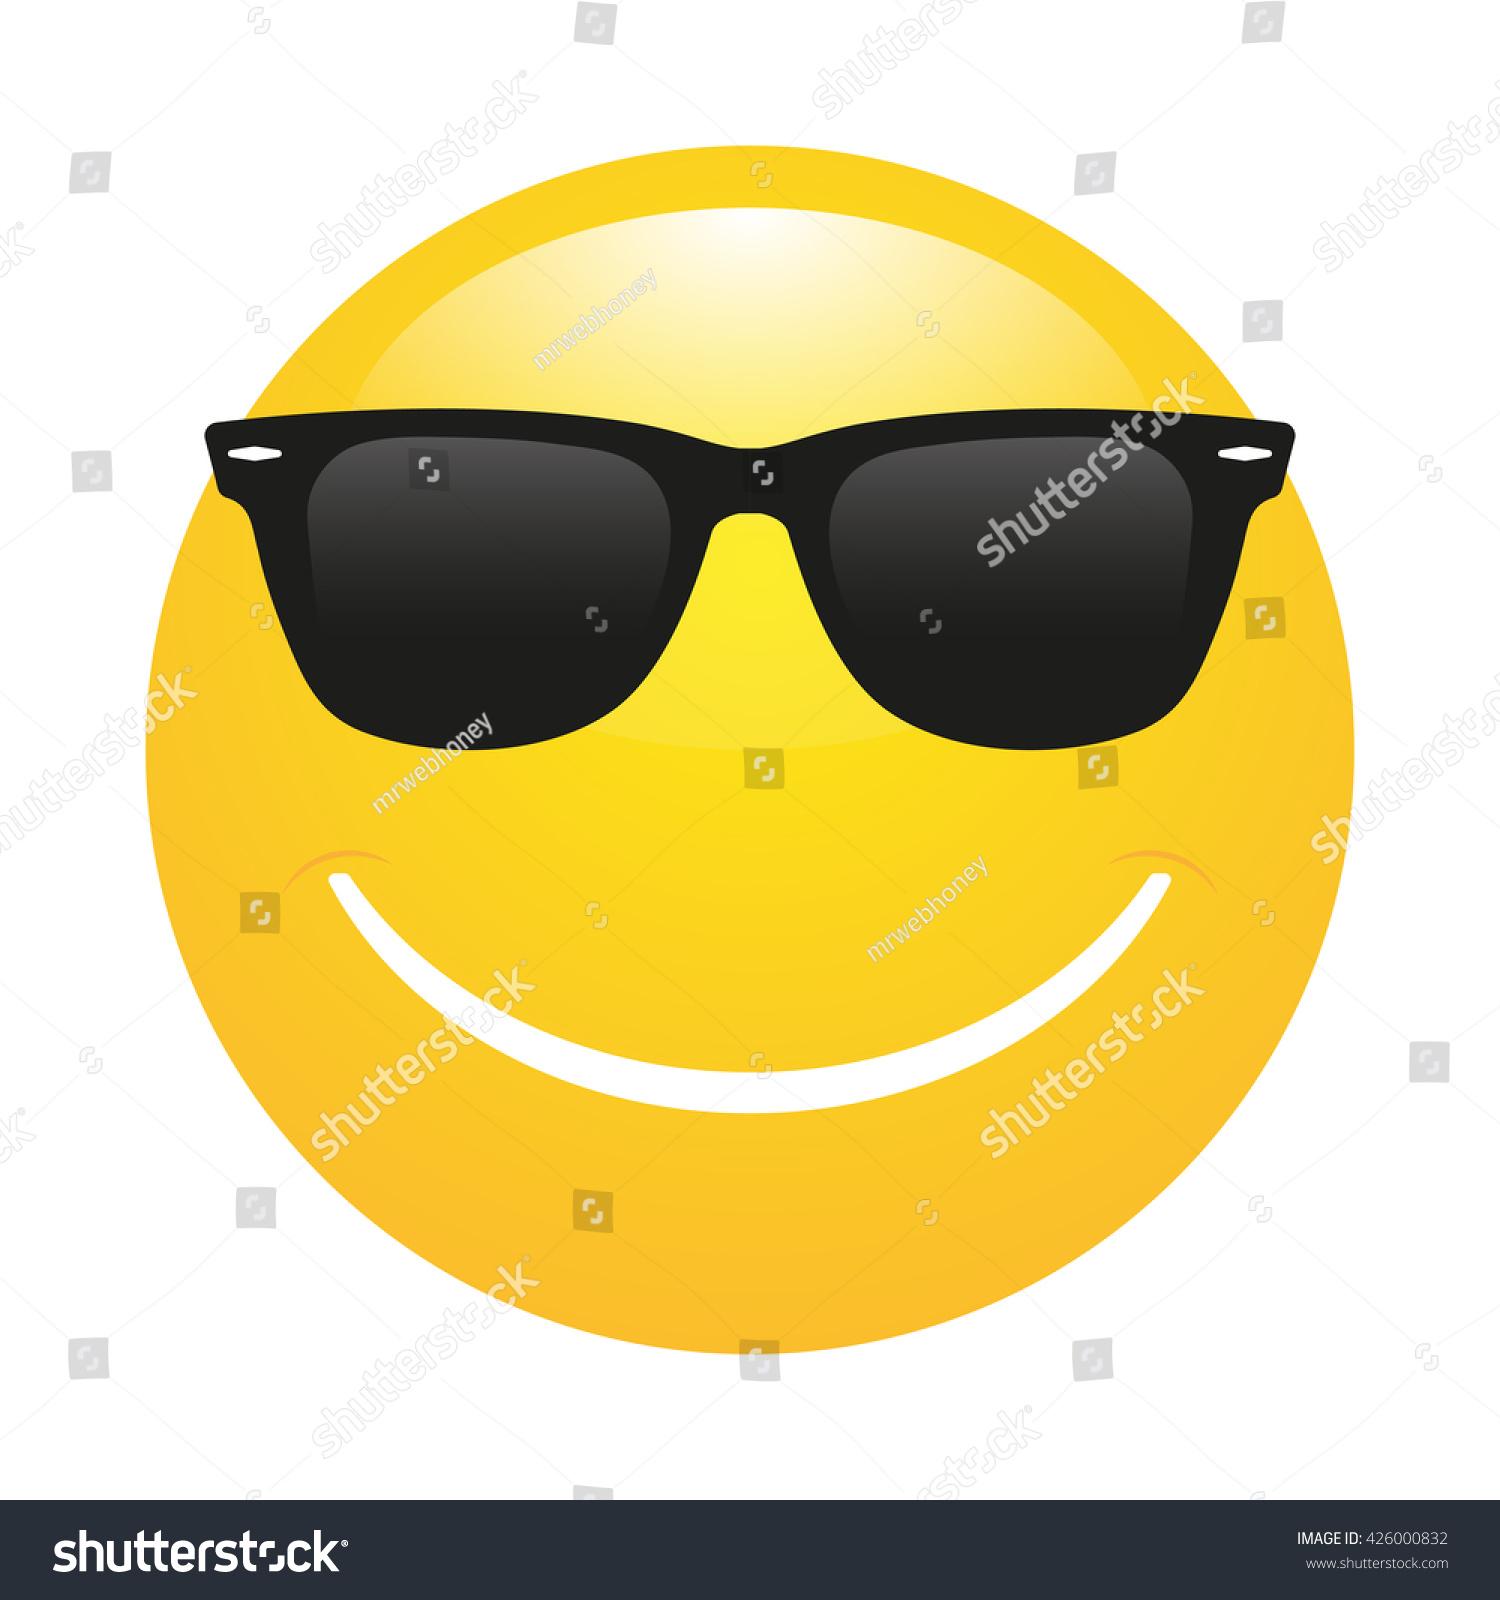 Smiley emoticon in sunglasses